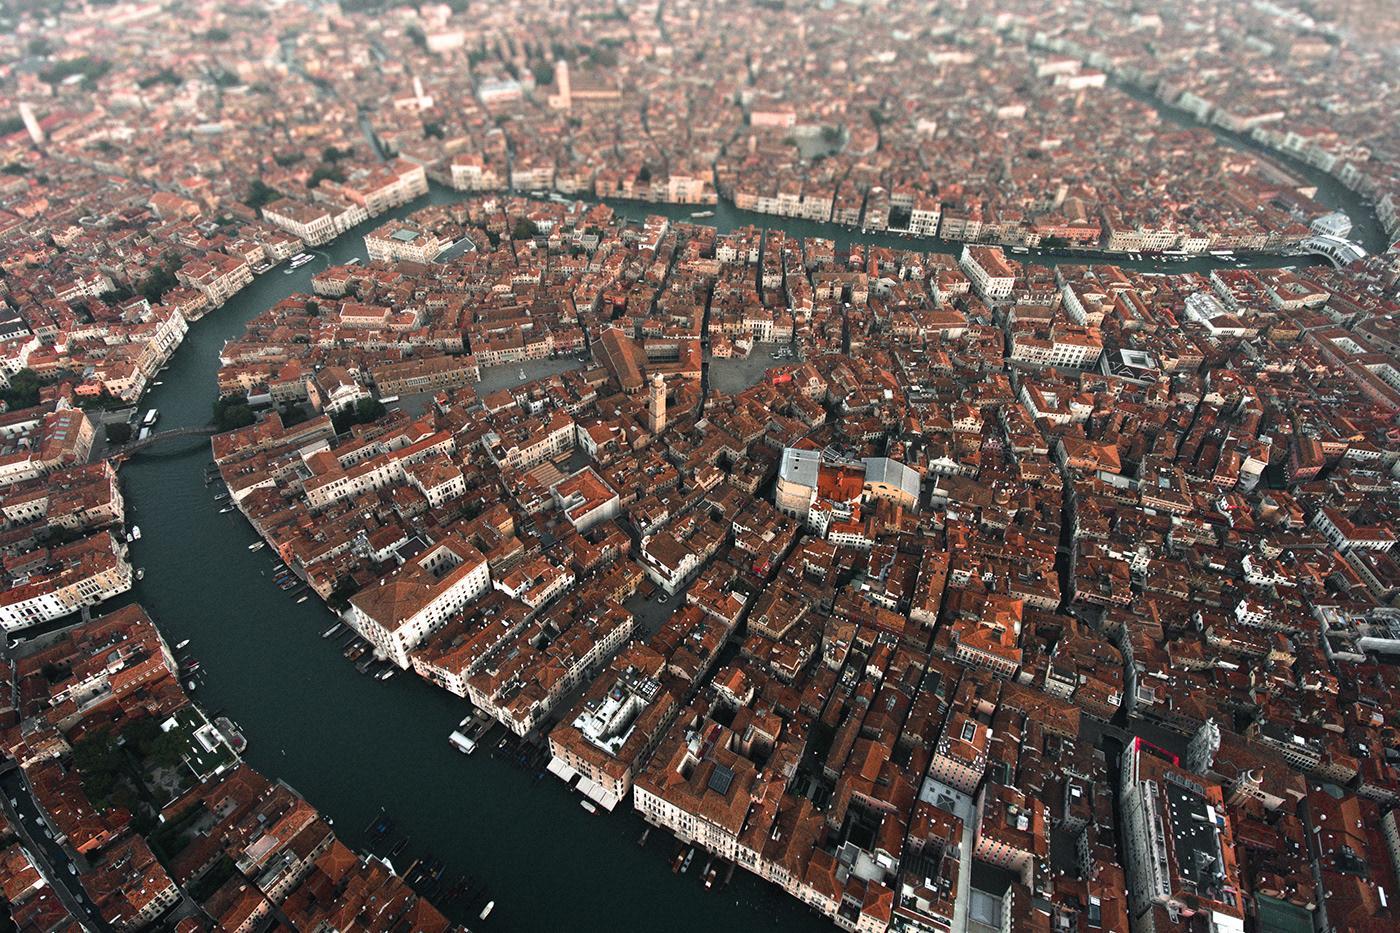 Venice - shot with a DJI Phantom 4. (Credit:Dimitar Karanikolov /BehanceCC BY-NC-ND 4.0)